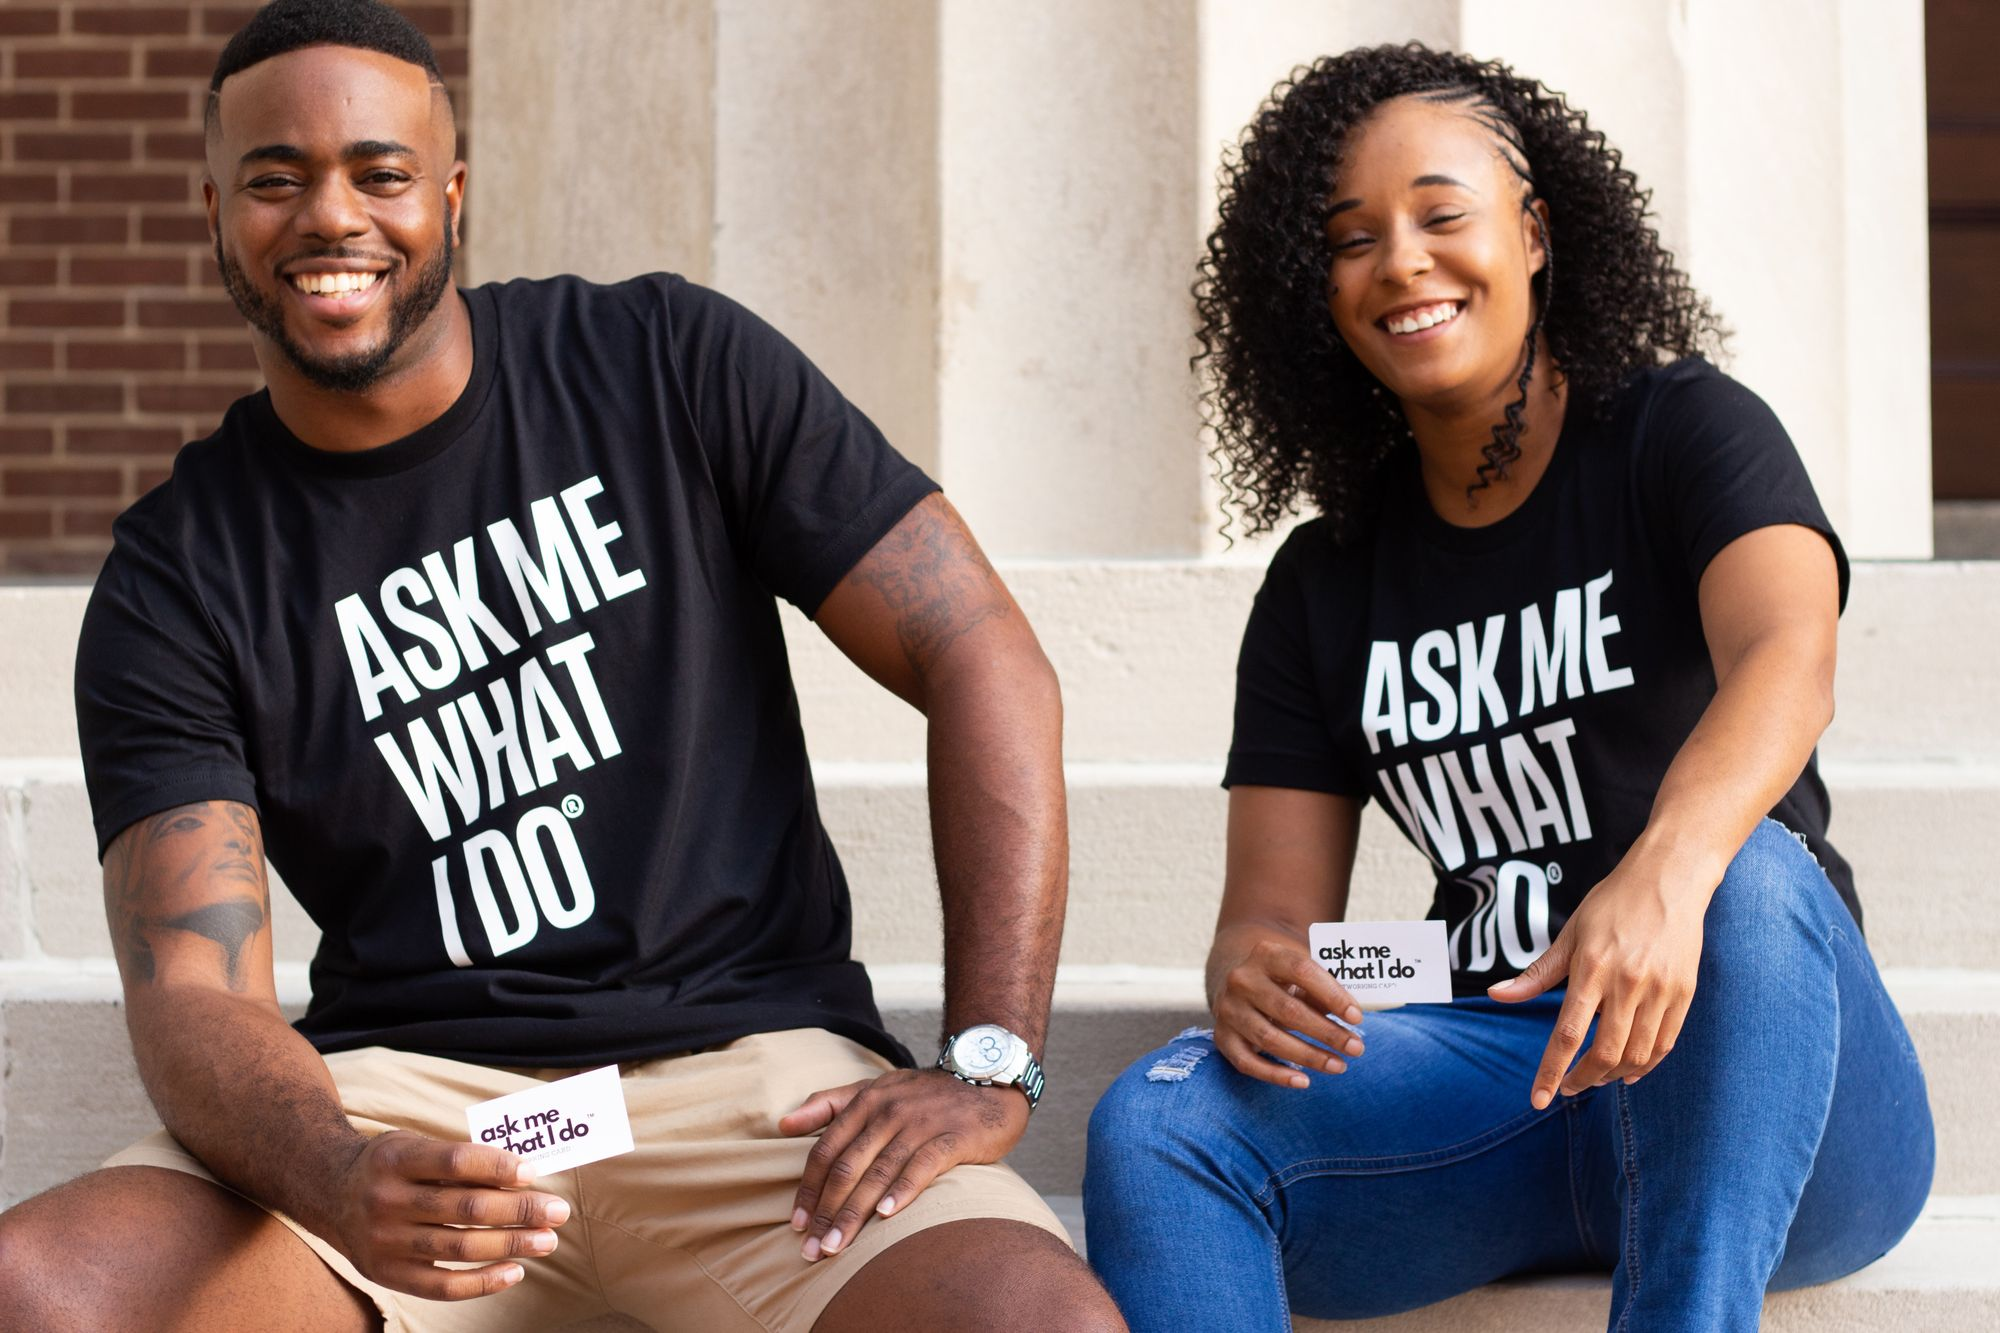 How to Start a T-shirt Business?